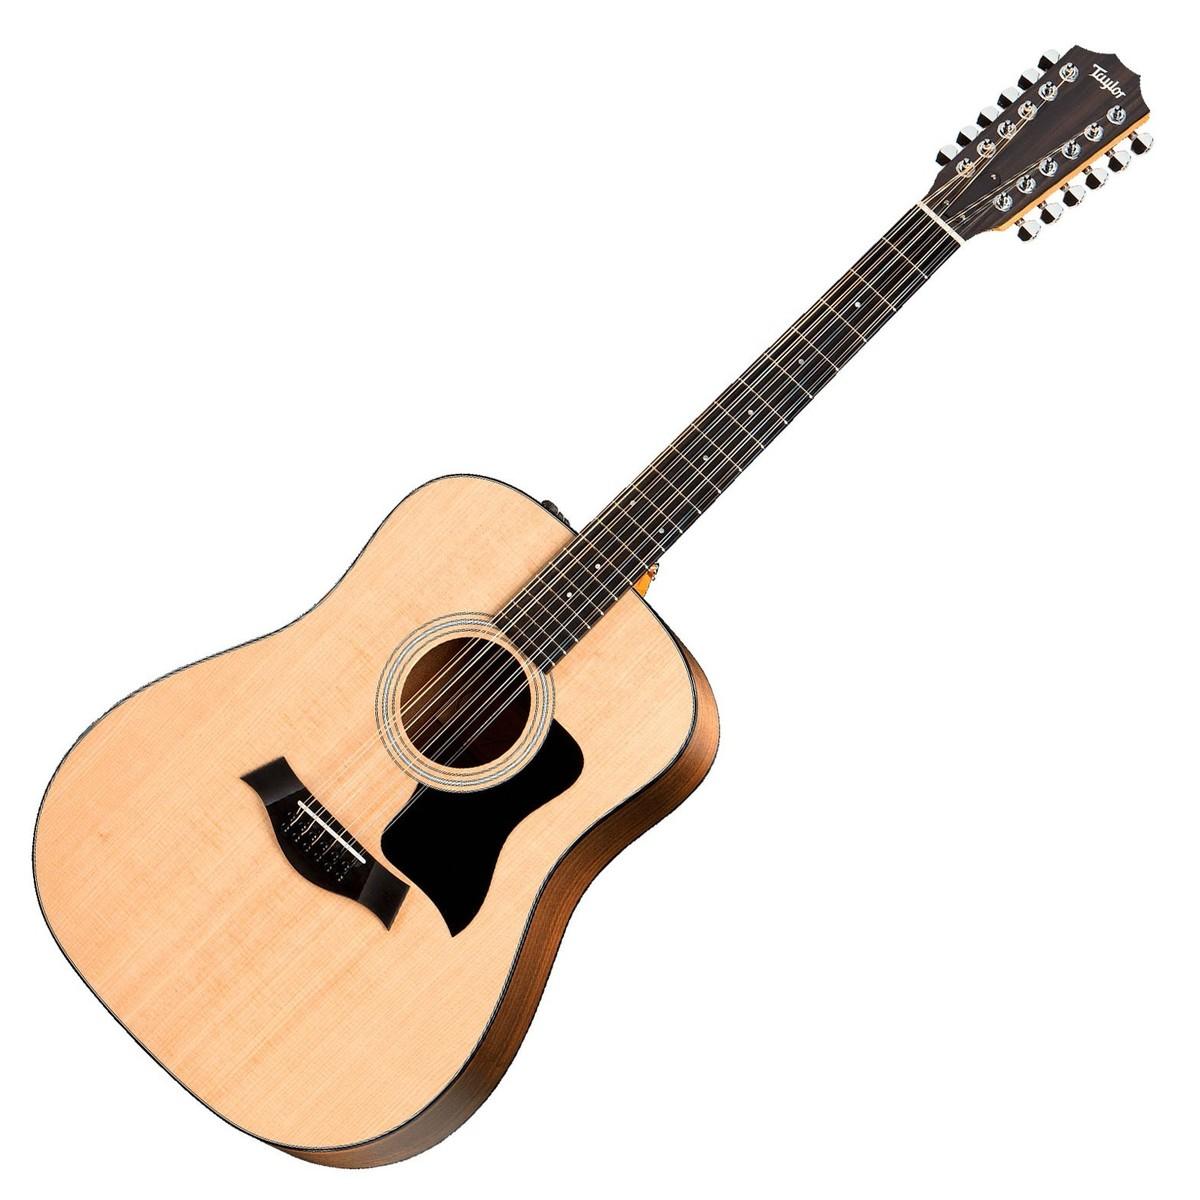 Taylor e string dreadnought. Banjo clipart western guitar